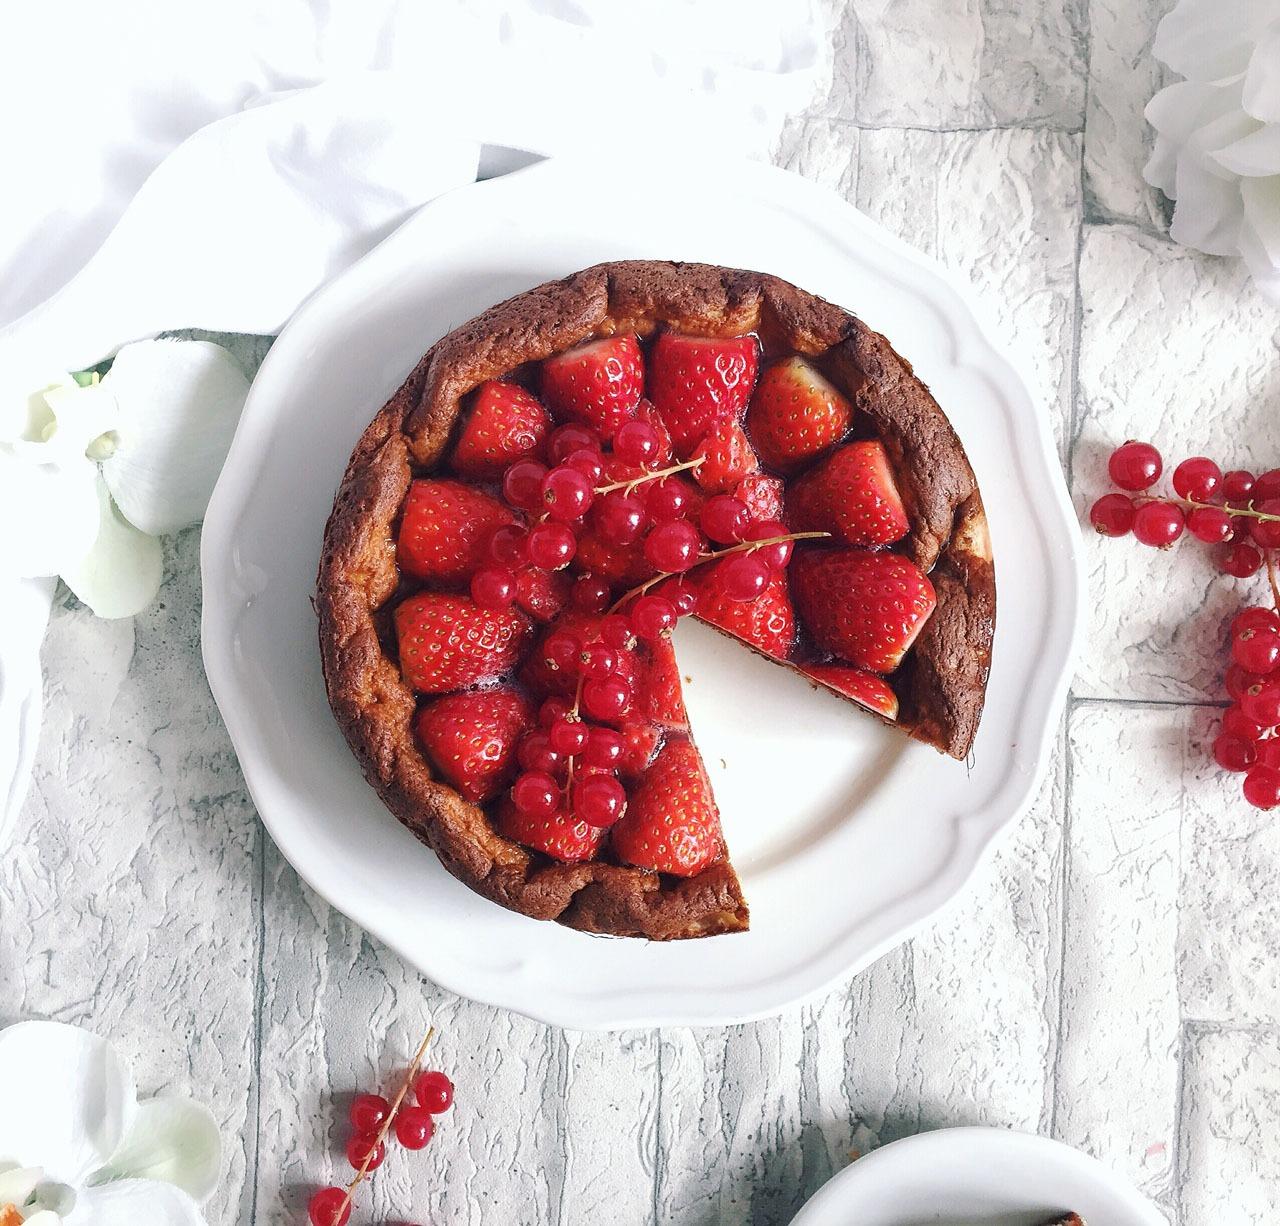 Erdbeer Kokos Torte Rezept nachkochen